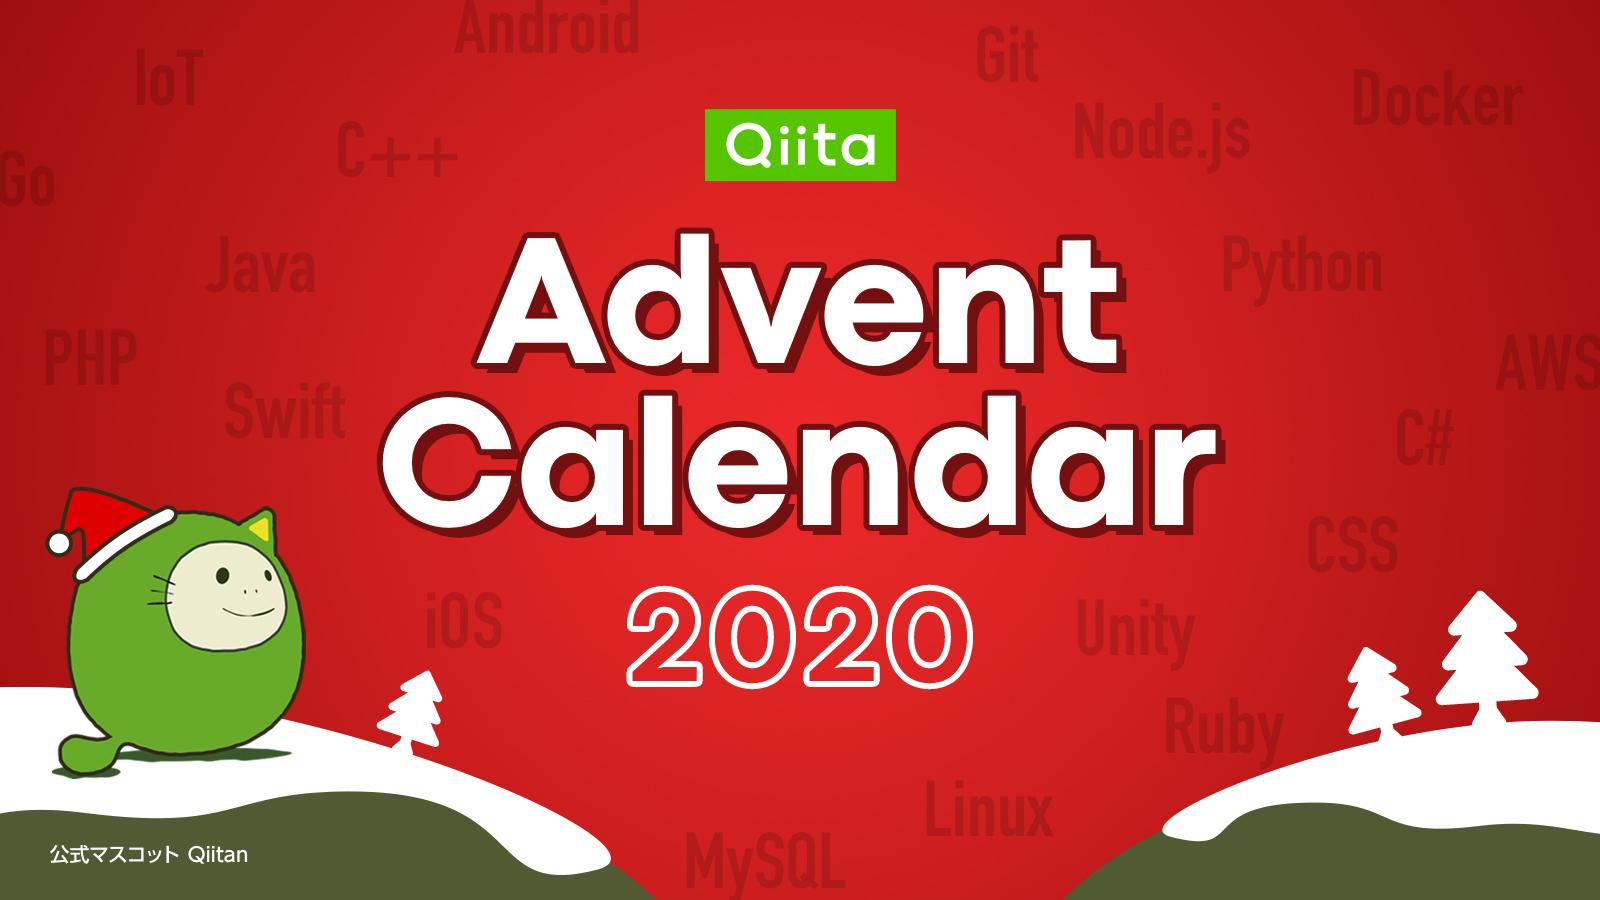 Qiita Advent Calendar 2020